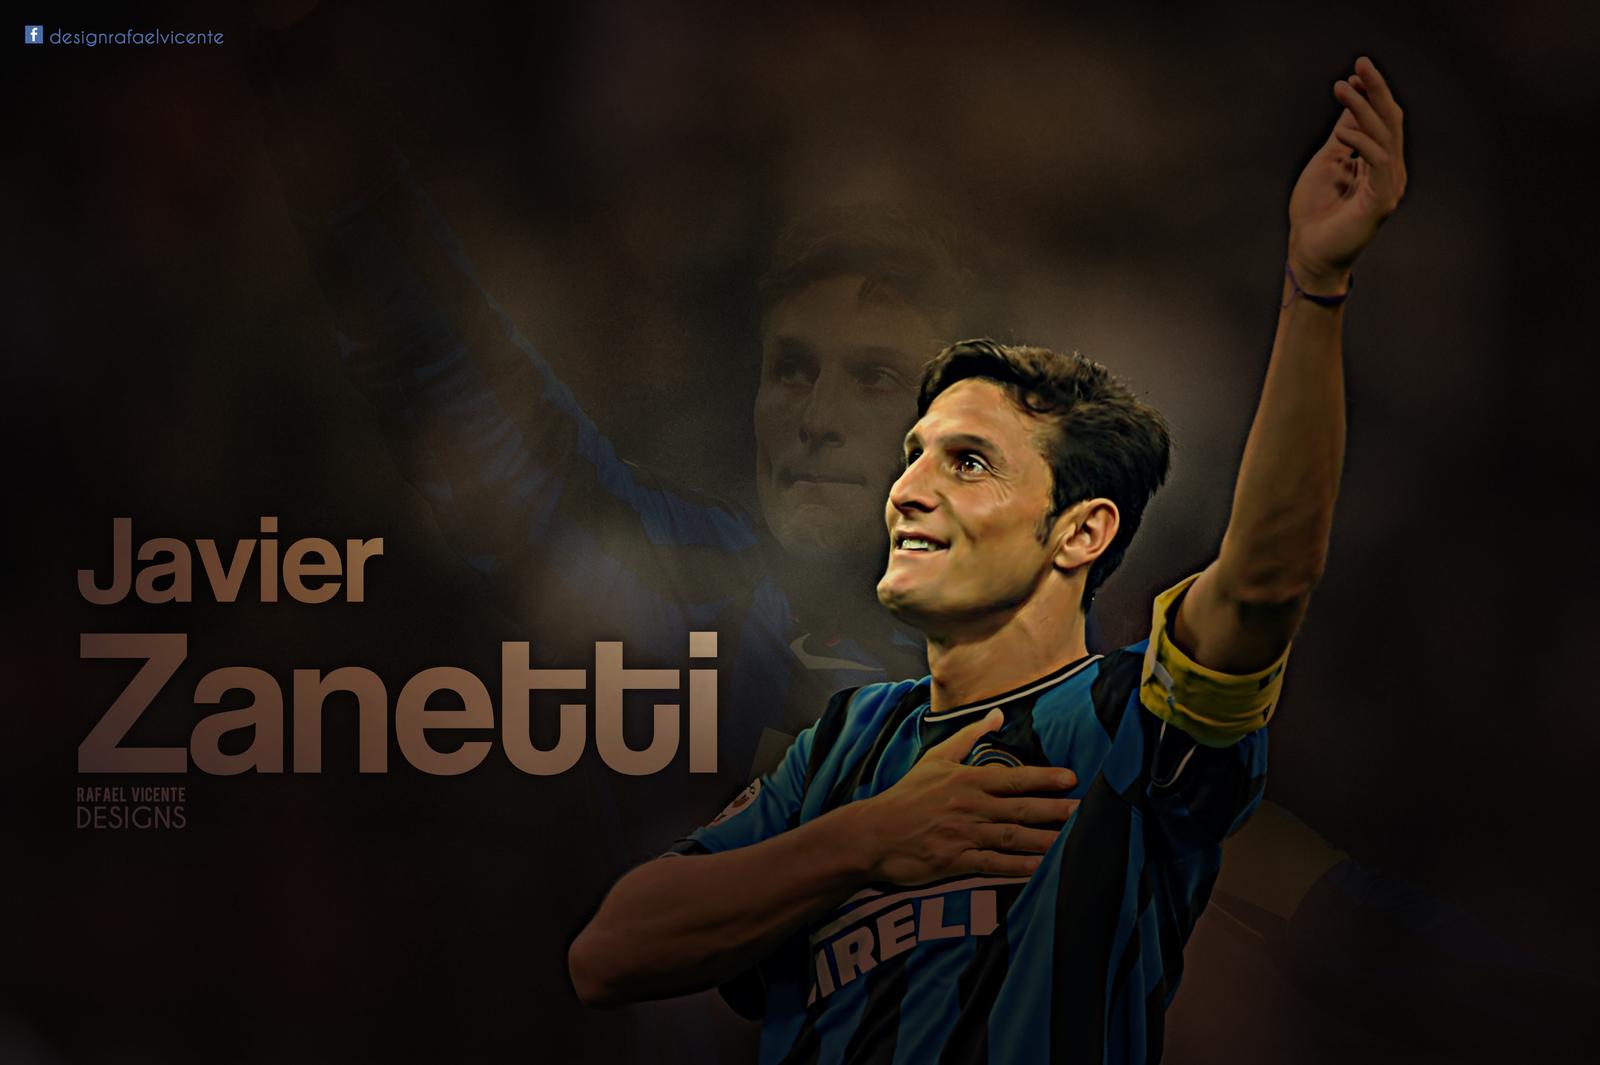 Javier Zanetti wallpaper by RafaelVicenteDesigns on DeviantArt